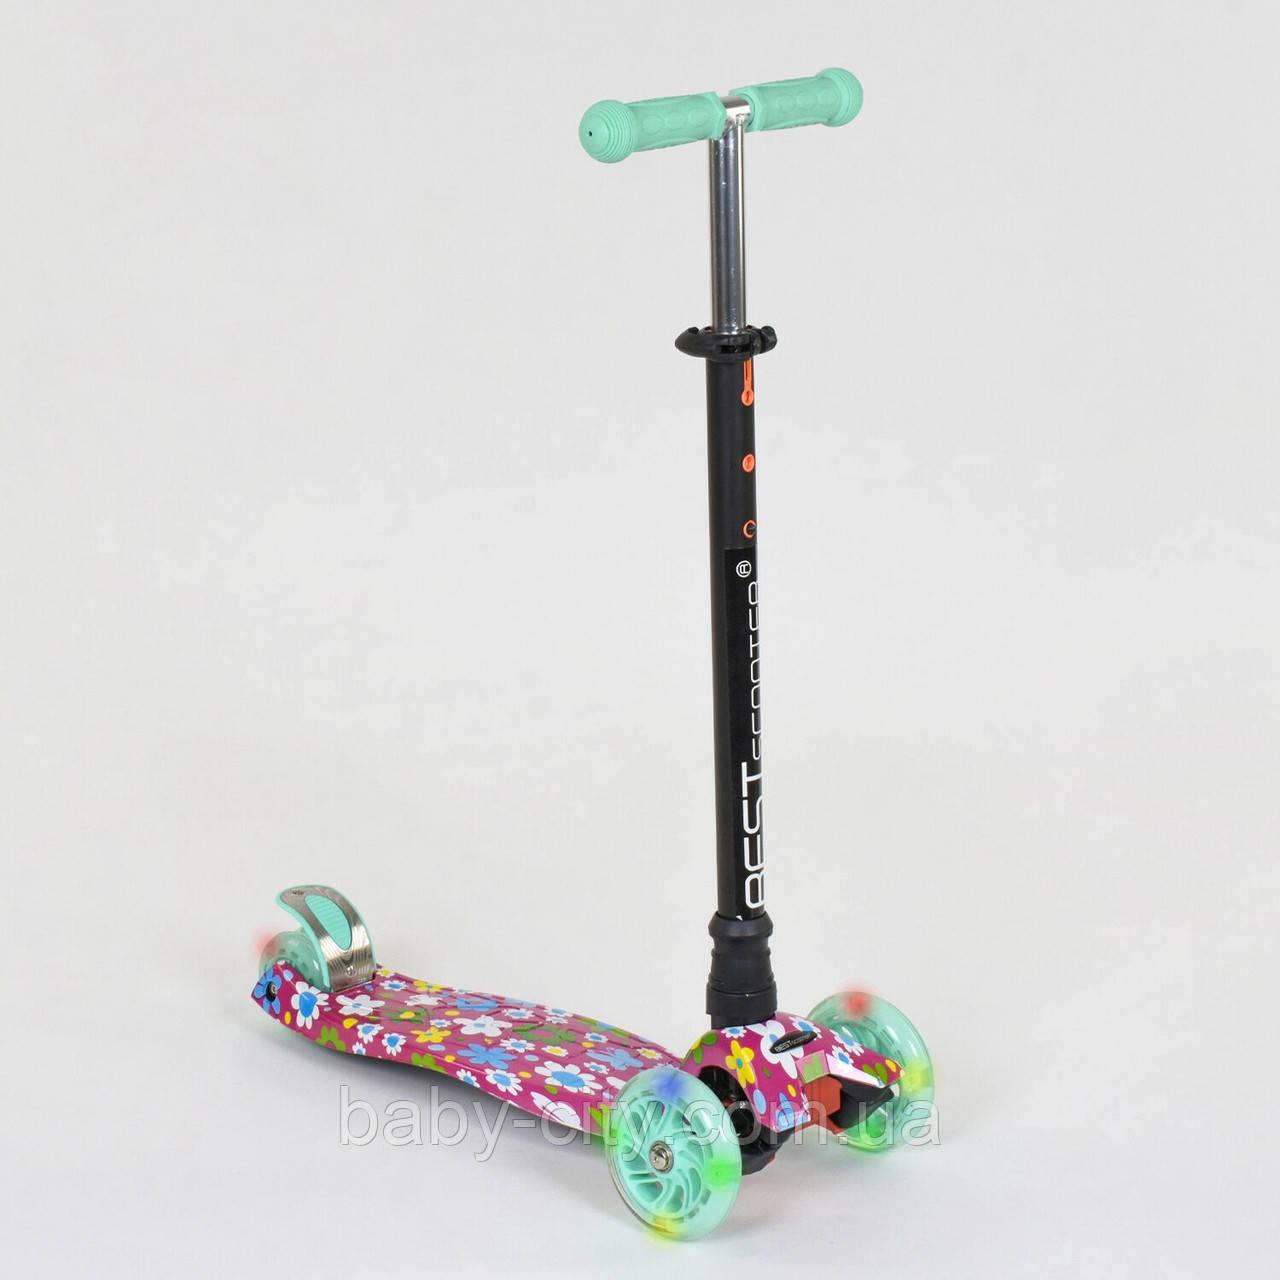 Трехколесный самокат Best Scooter Maxi А 25600 /779-1343